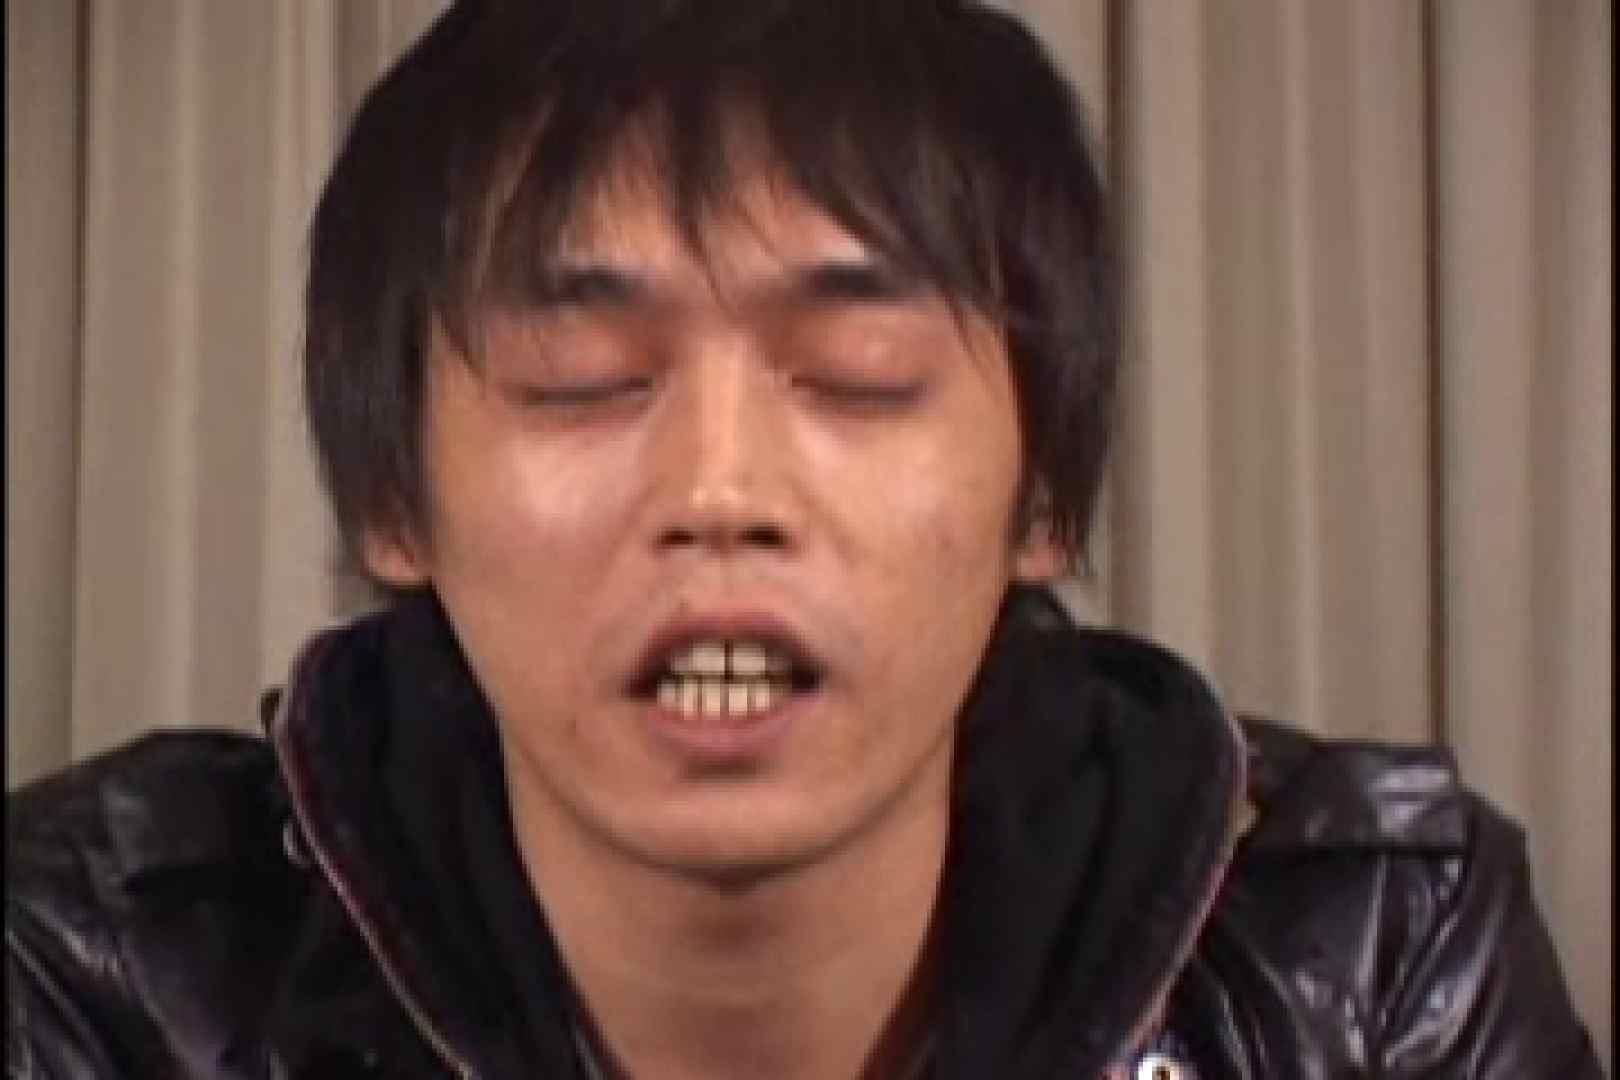 BEST OF イケメン!!男目線のガチSEX vol.04(対女性作品) 対女性 | イケメン・パラダイス  55画像 21